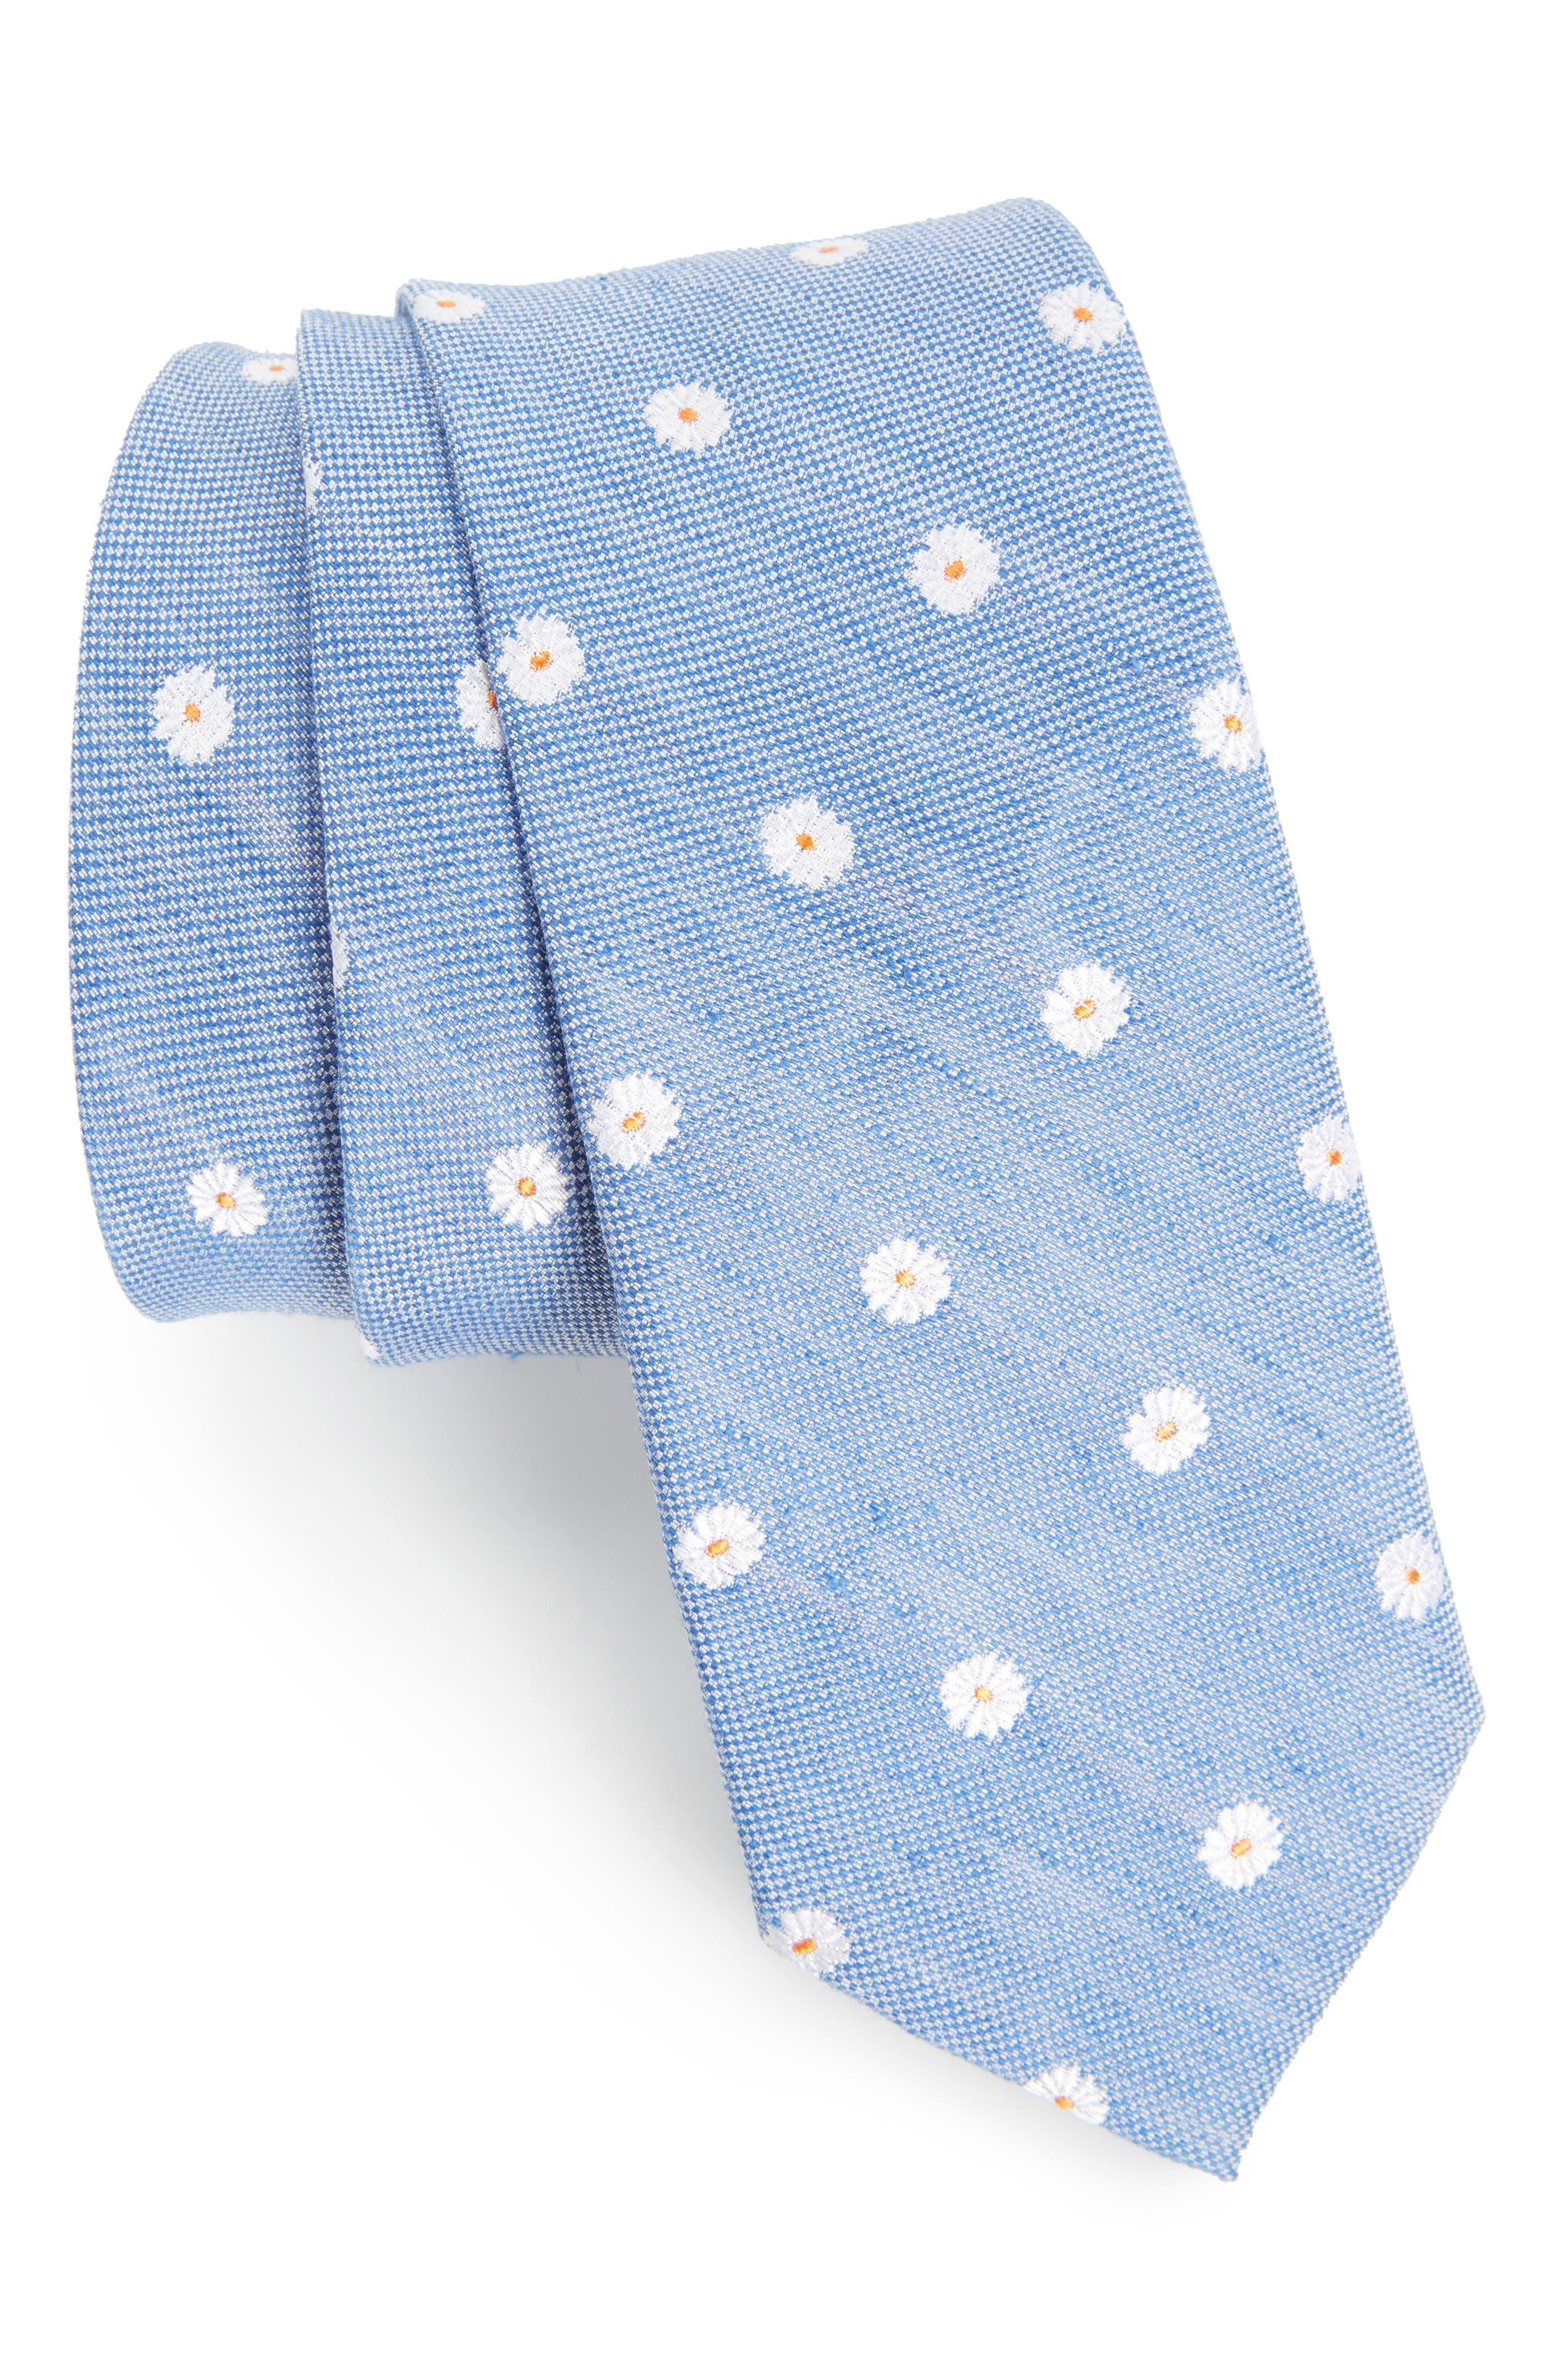 Hogard Floral Linen & Silk Skinny Tie,                         Main,                         color, Blue